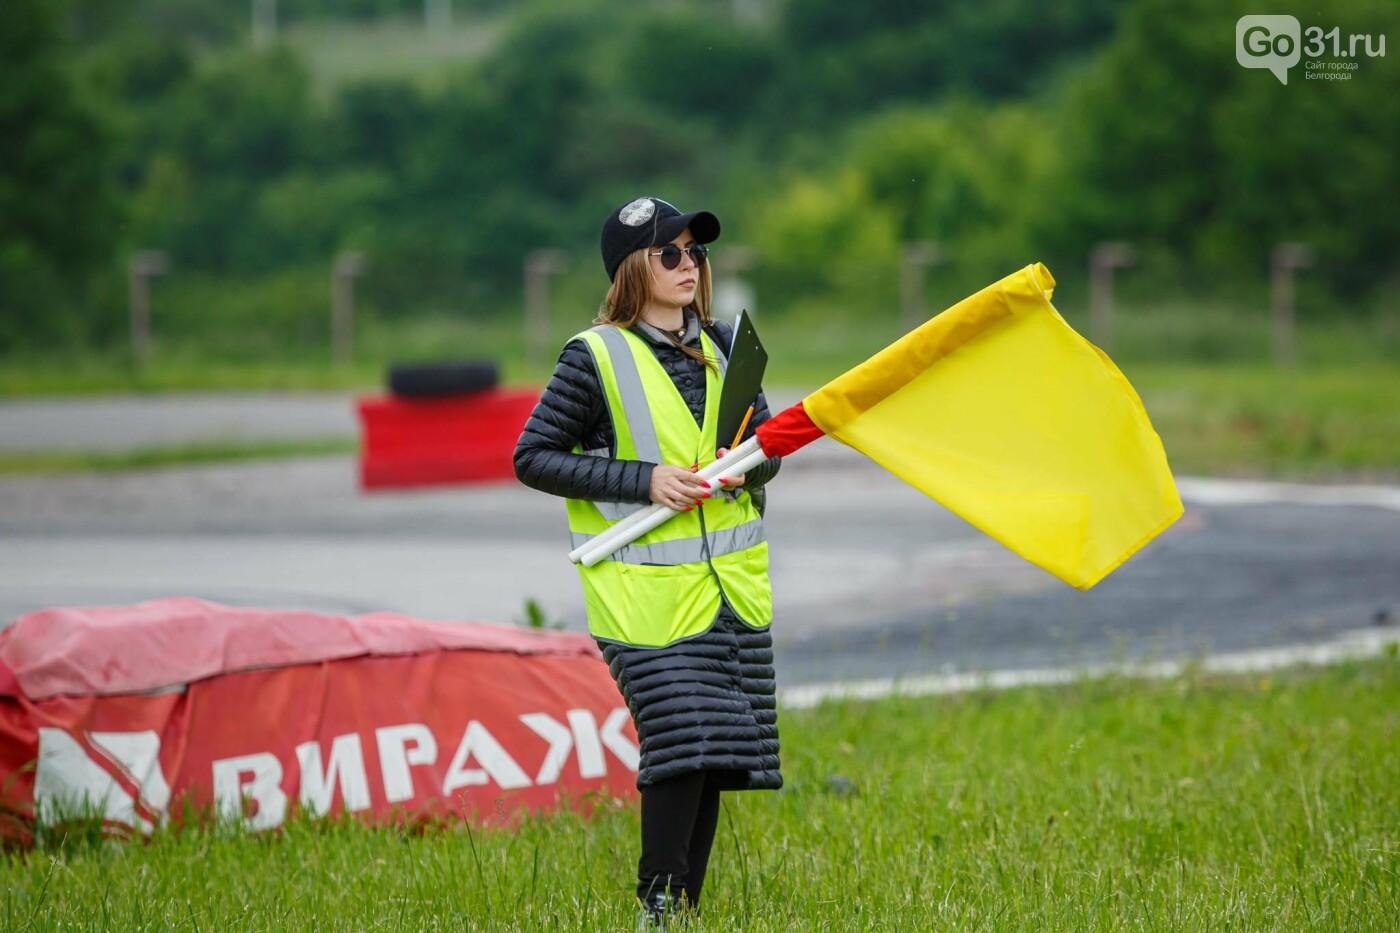 Фестиваль Rally BelGoRoad, Фото: Антон Вергун